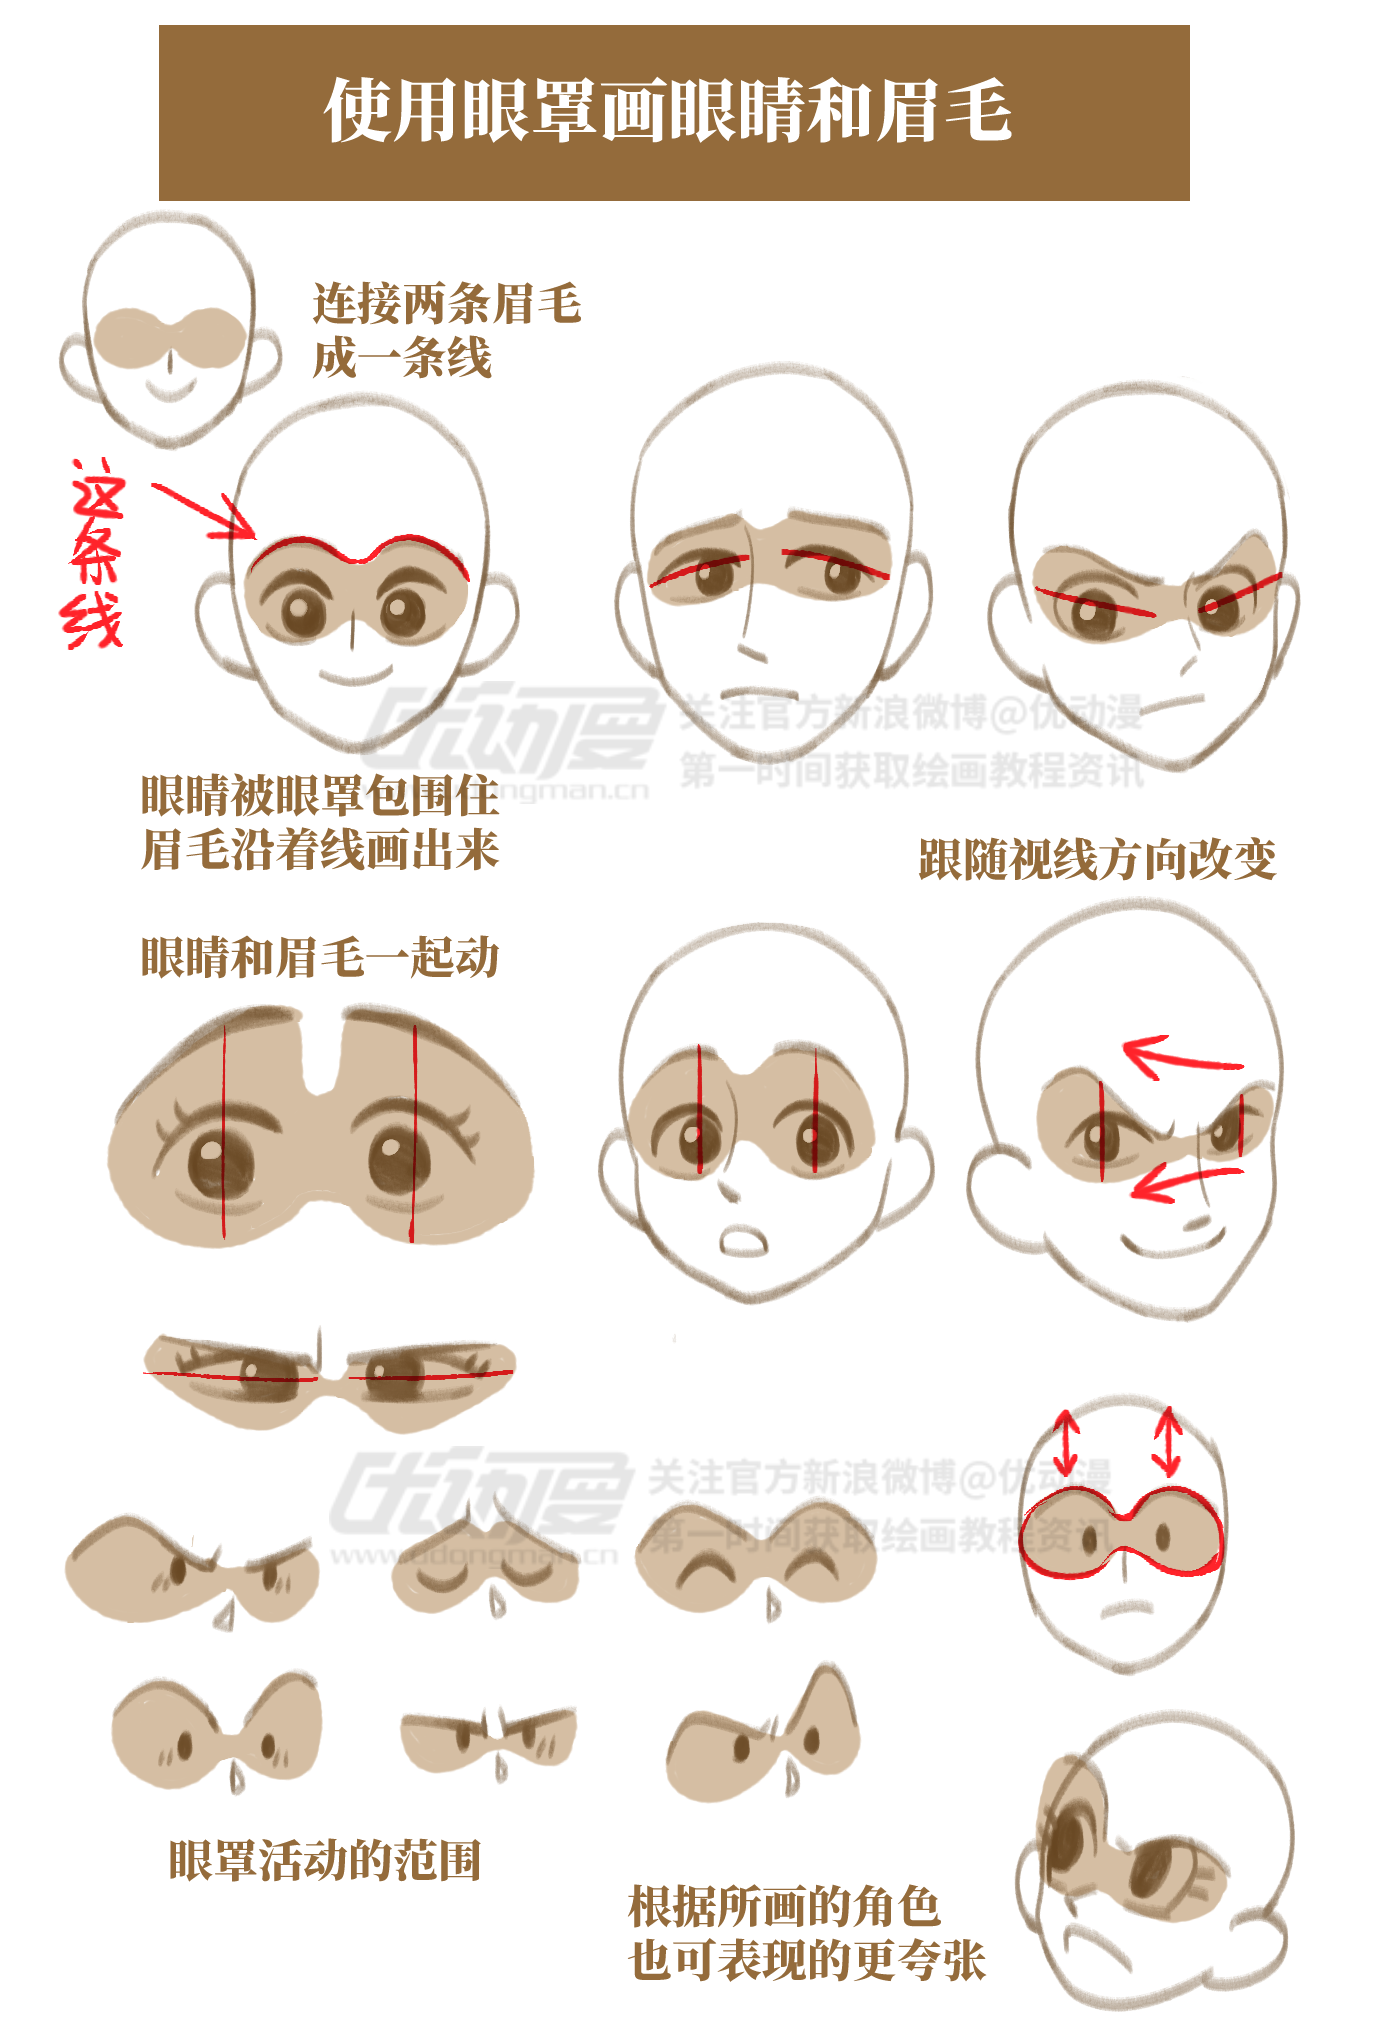 使用眼罩画眼睛和眉毛.png